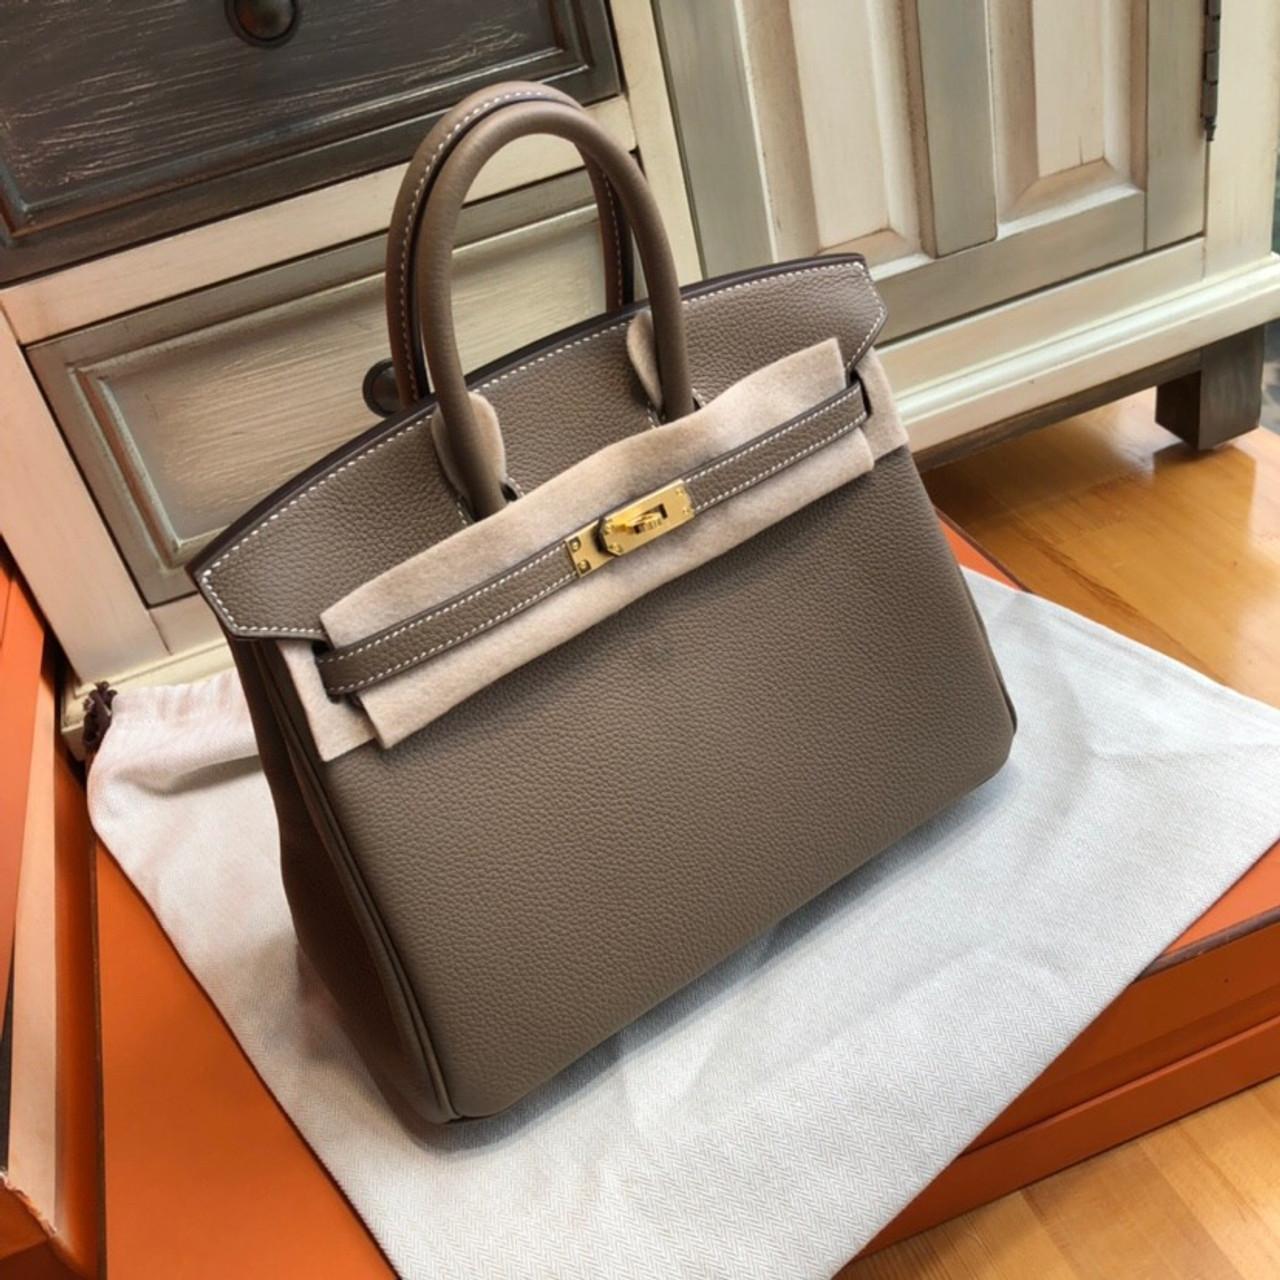 ee650ee1d95c Hermes 18 Etoupe Birkin 25 Togo leather Gold Hardware - Bella Vita Moda